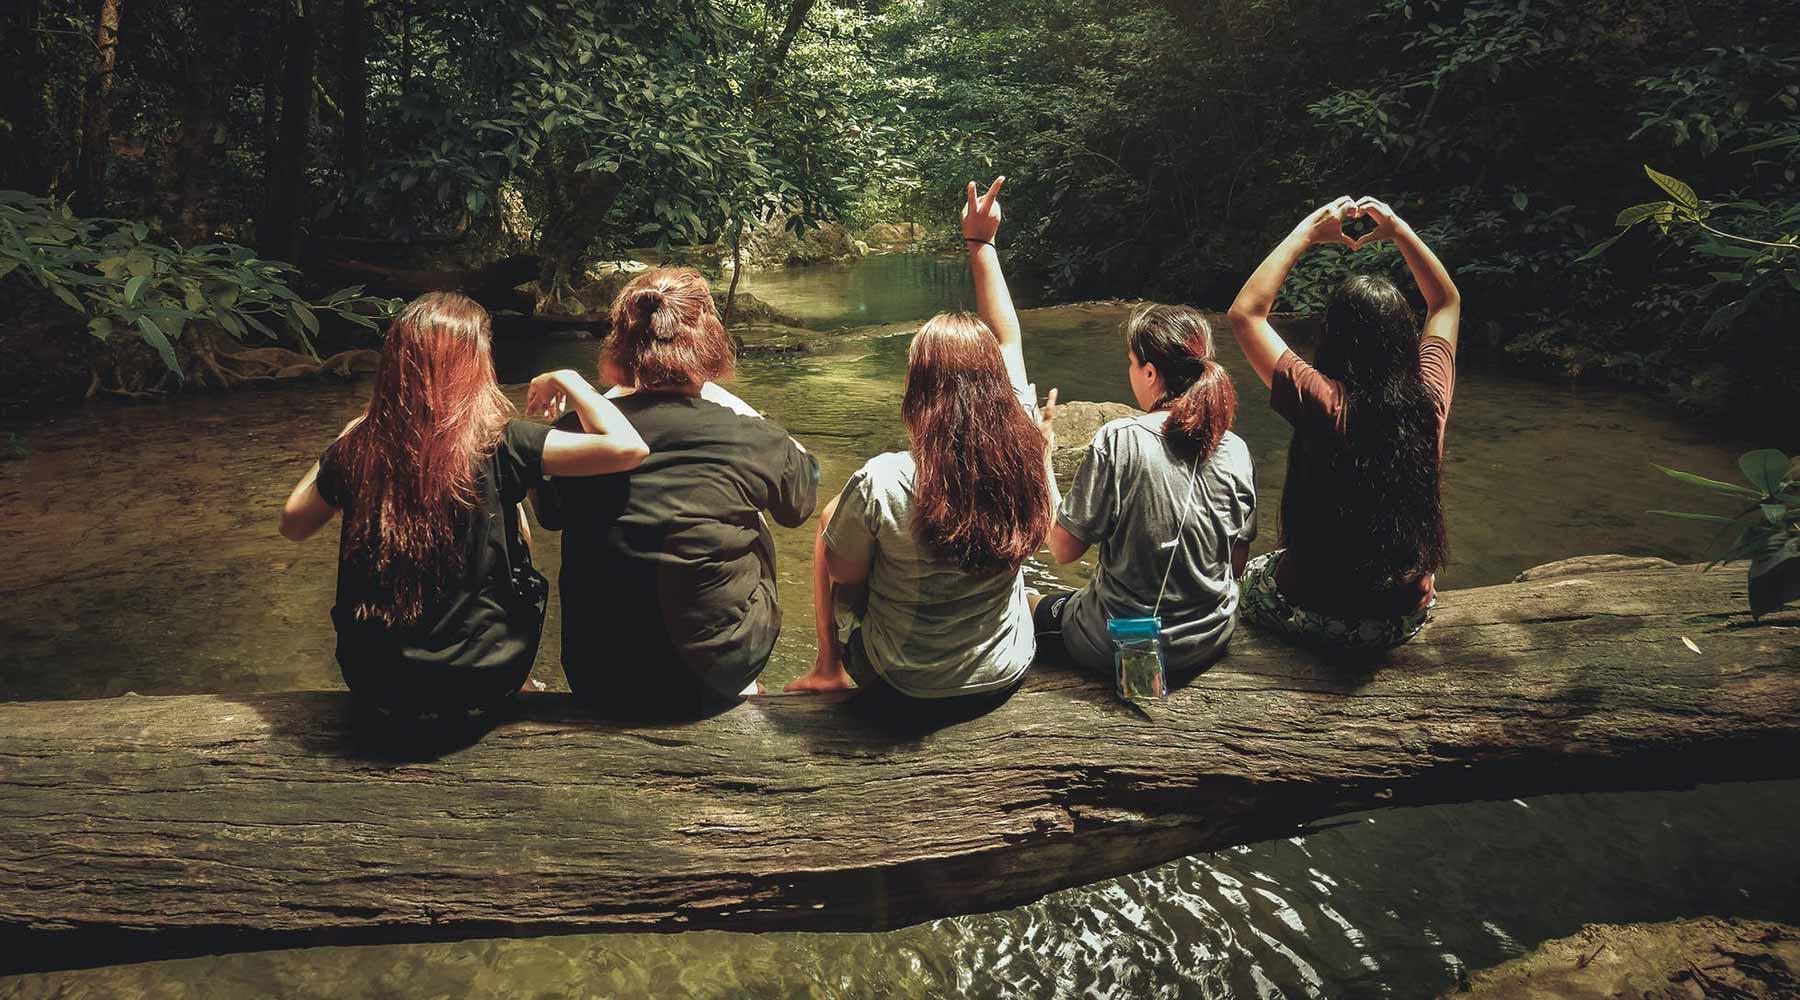 Youth at a river